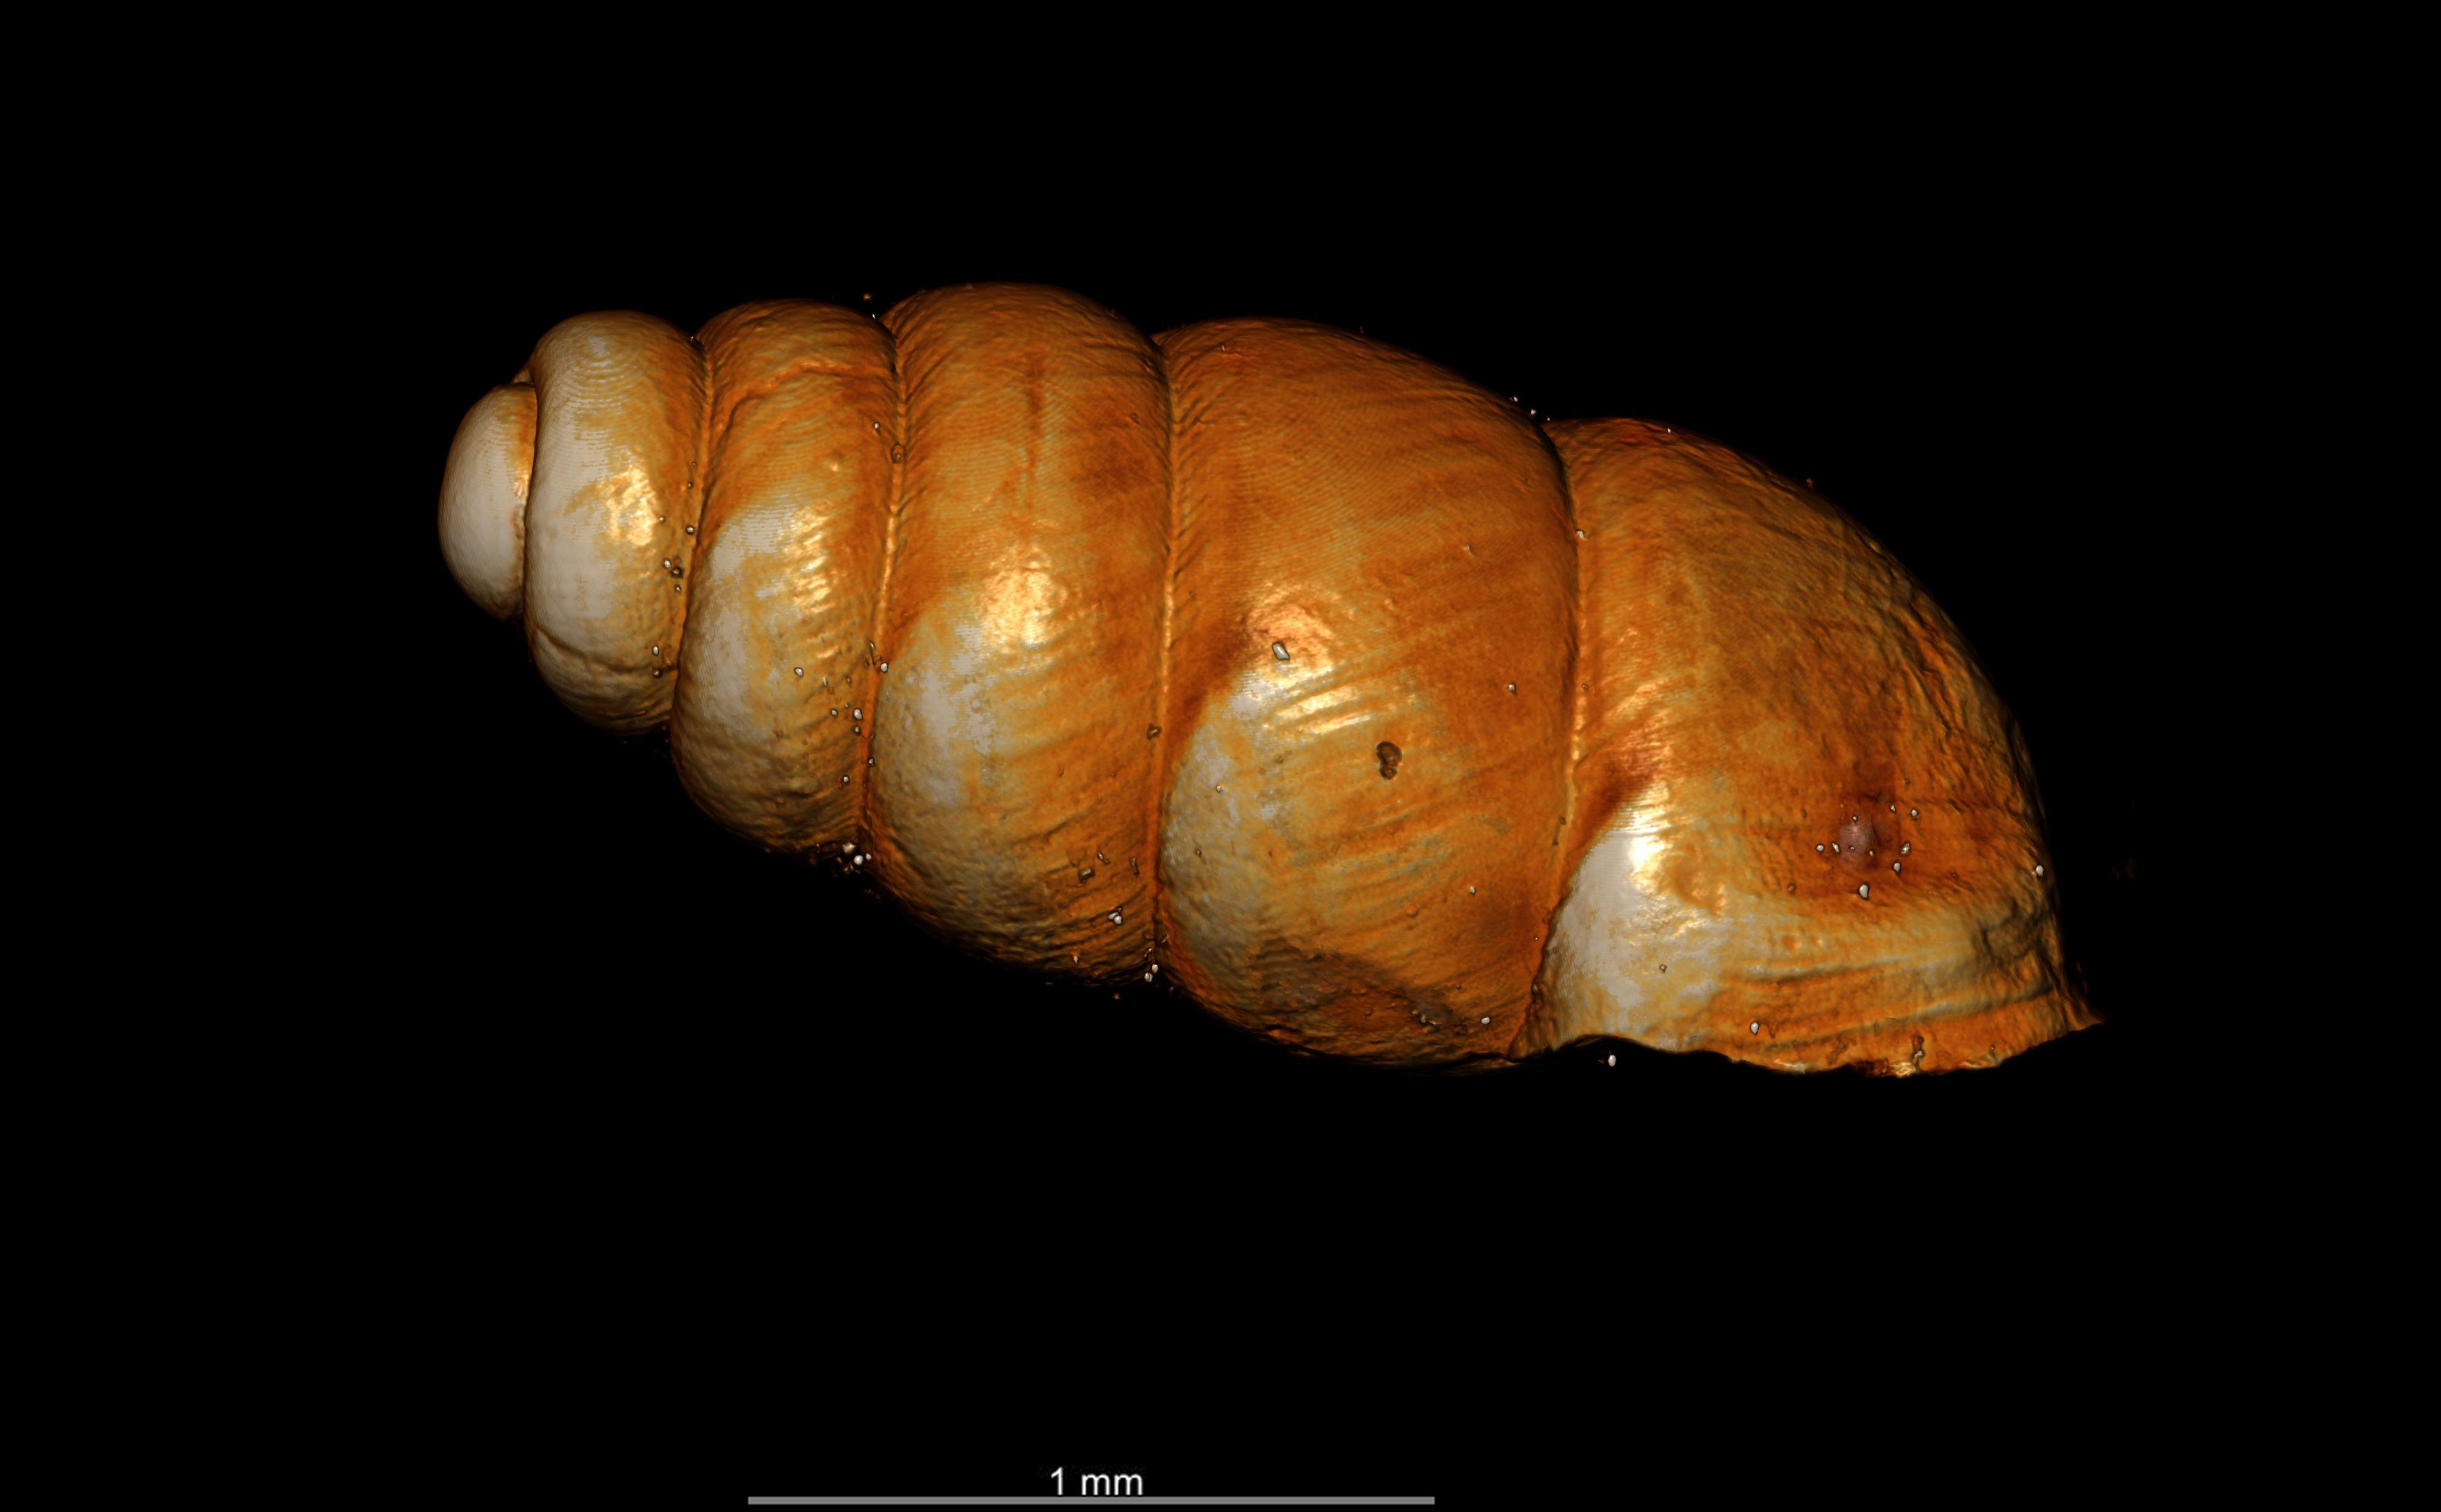 BE-RBINS-INV-TYPES-MT-2556-Gastrocopta-seignaciana-MCT-XRE-RIGHT.jpg